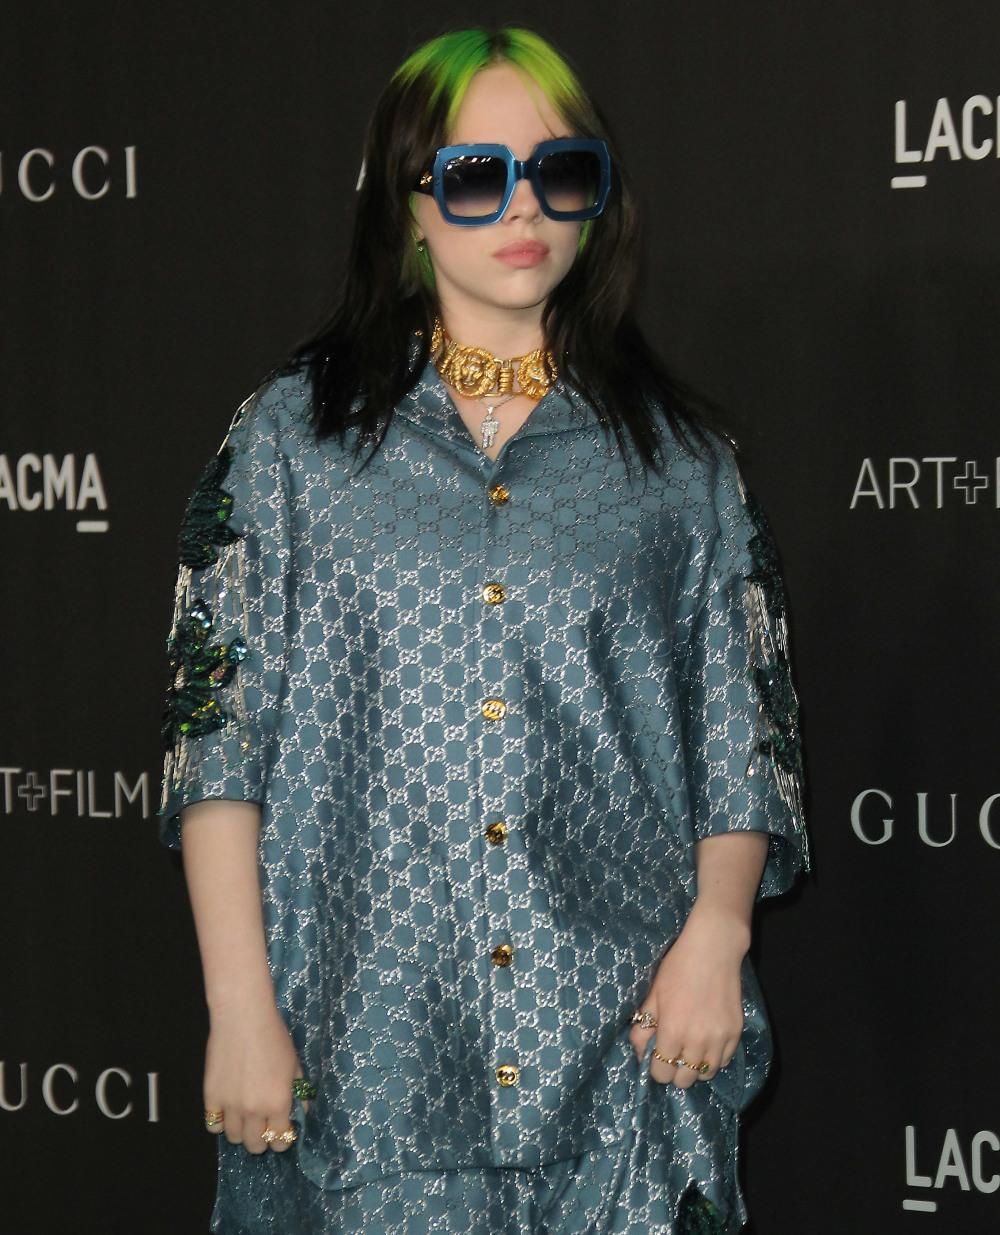 LACMA Art + Film Gala